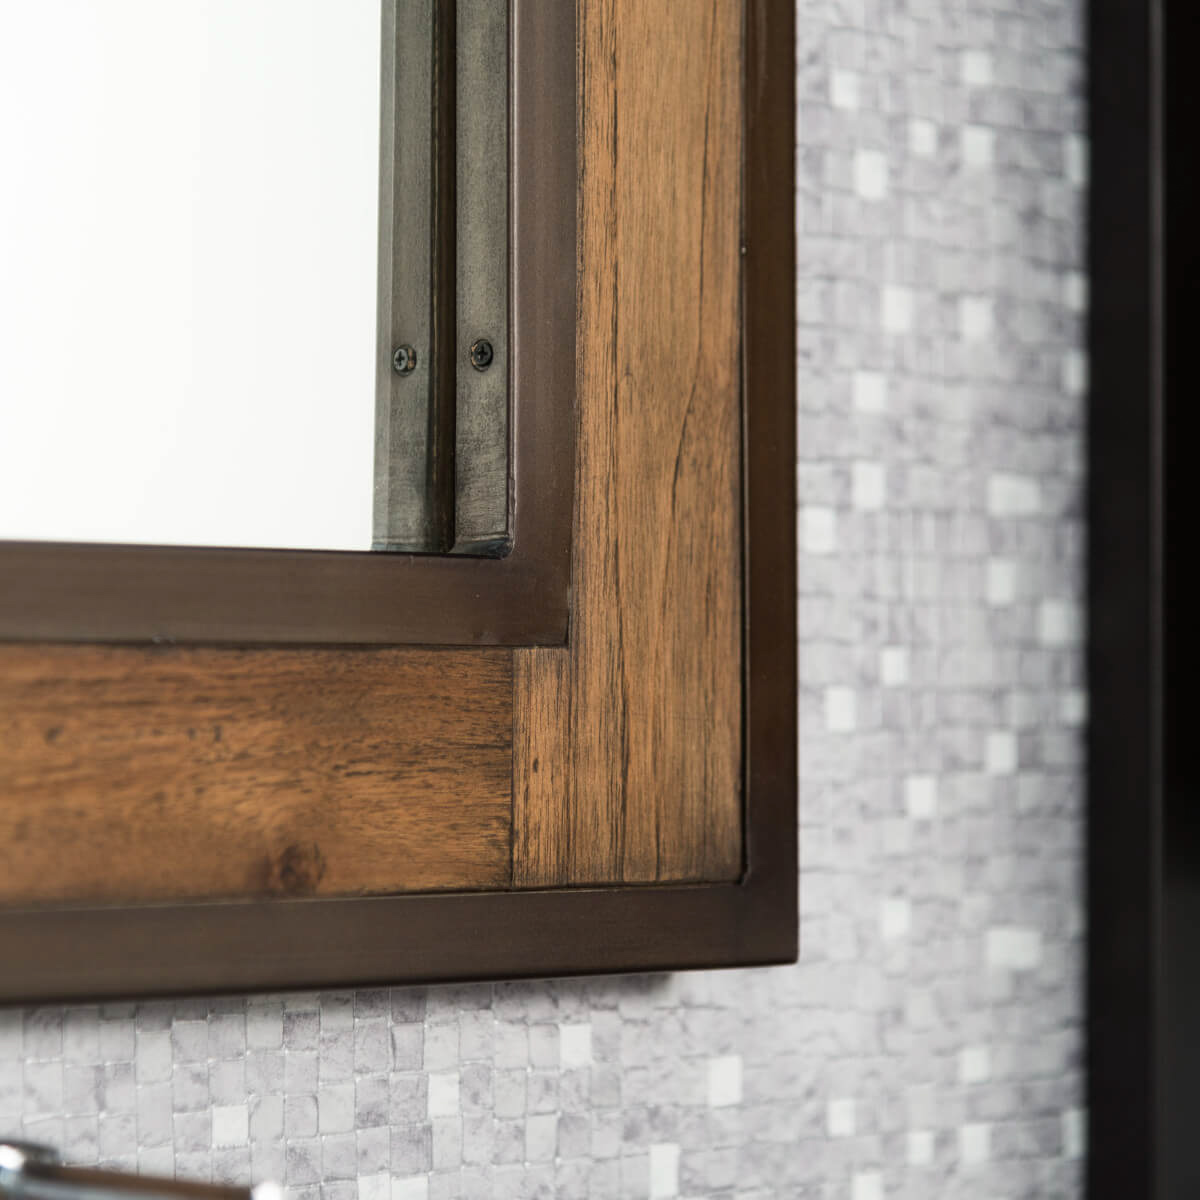 Miroir salle de bain bois m tal 60x80 cm for Salle de bain annee 60